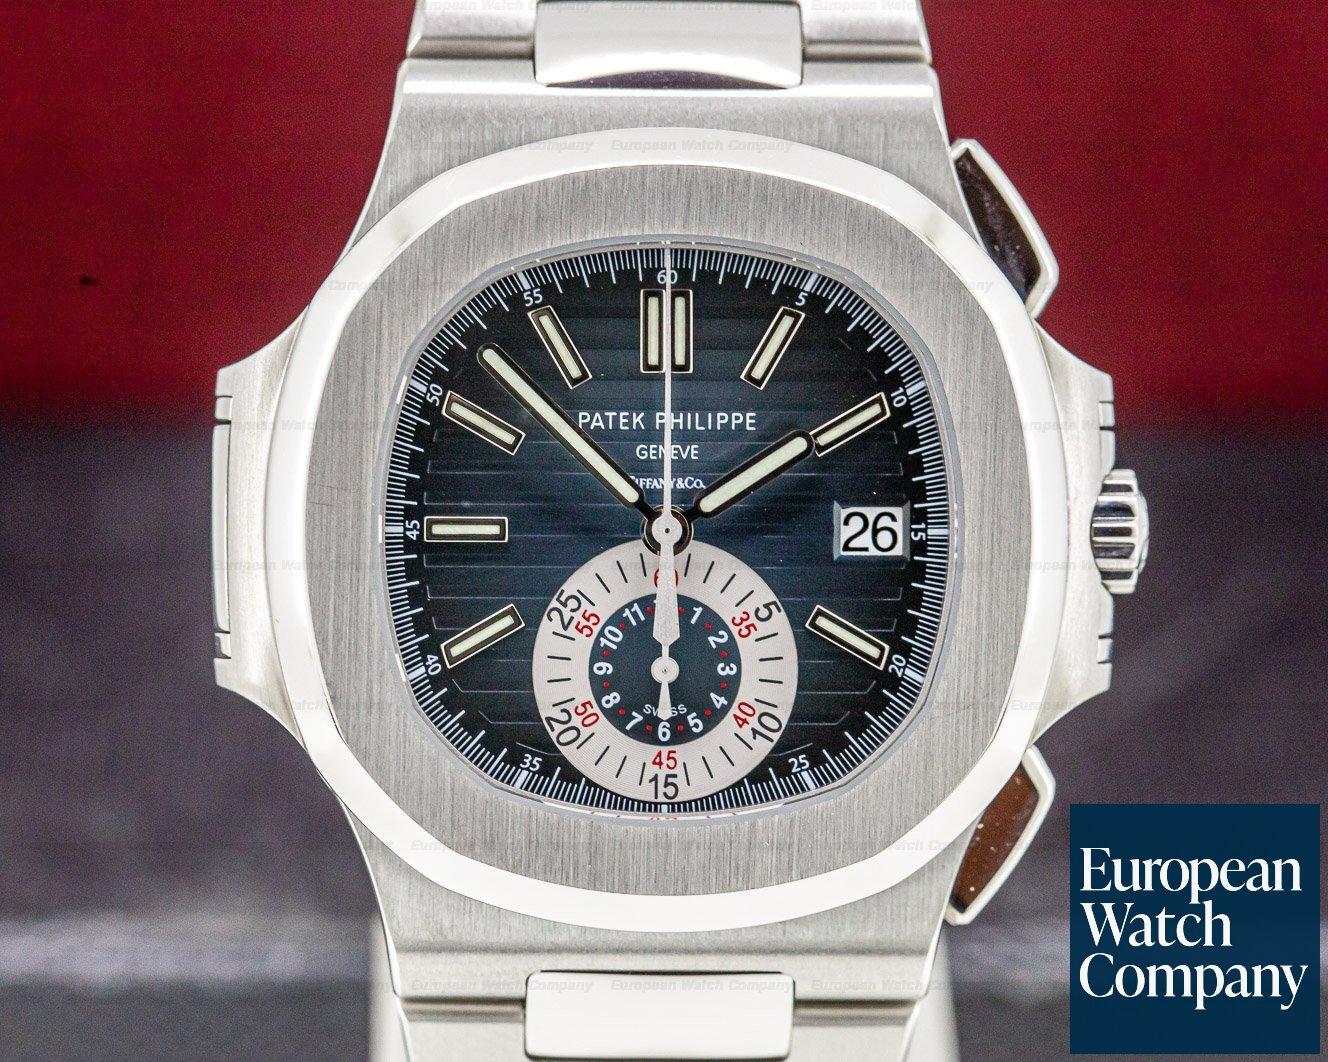 Patek Philippe 5980/1A-001 Nautilus Chronograph SS Blue Dial